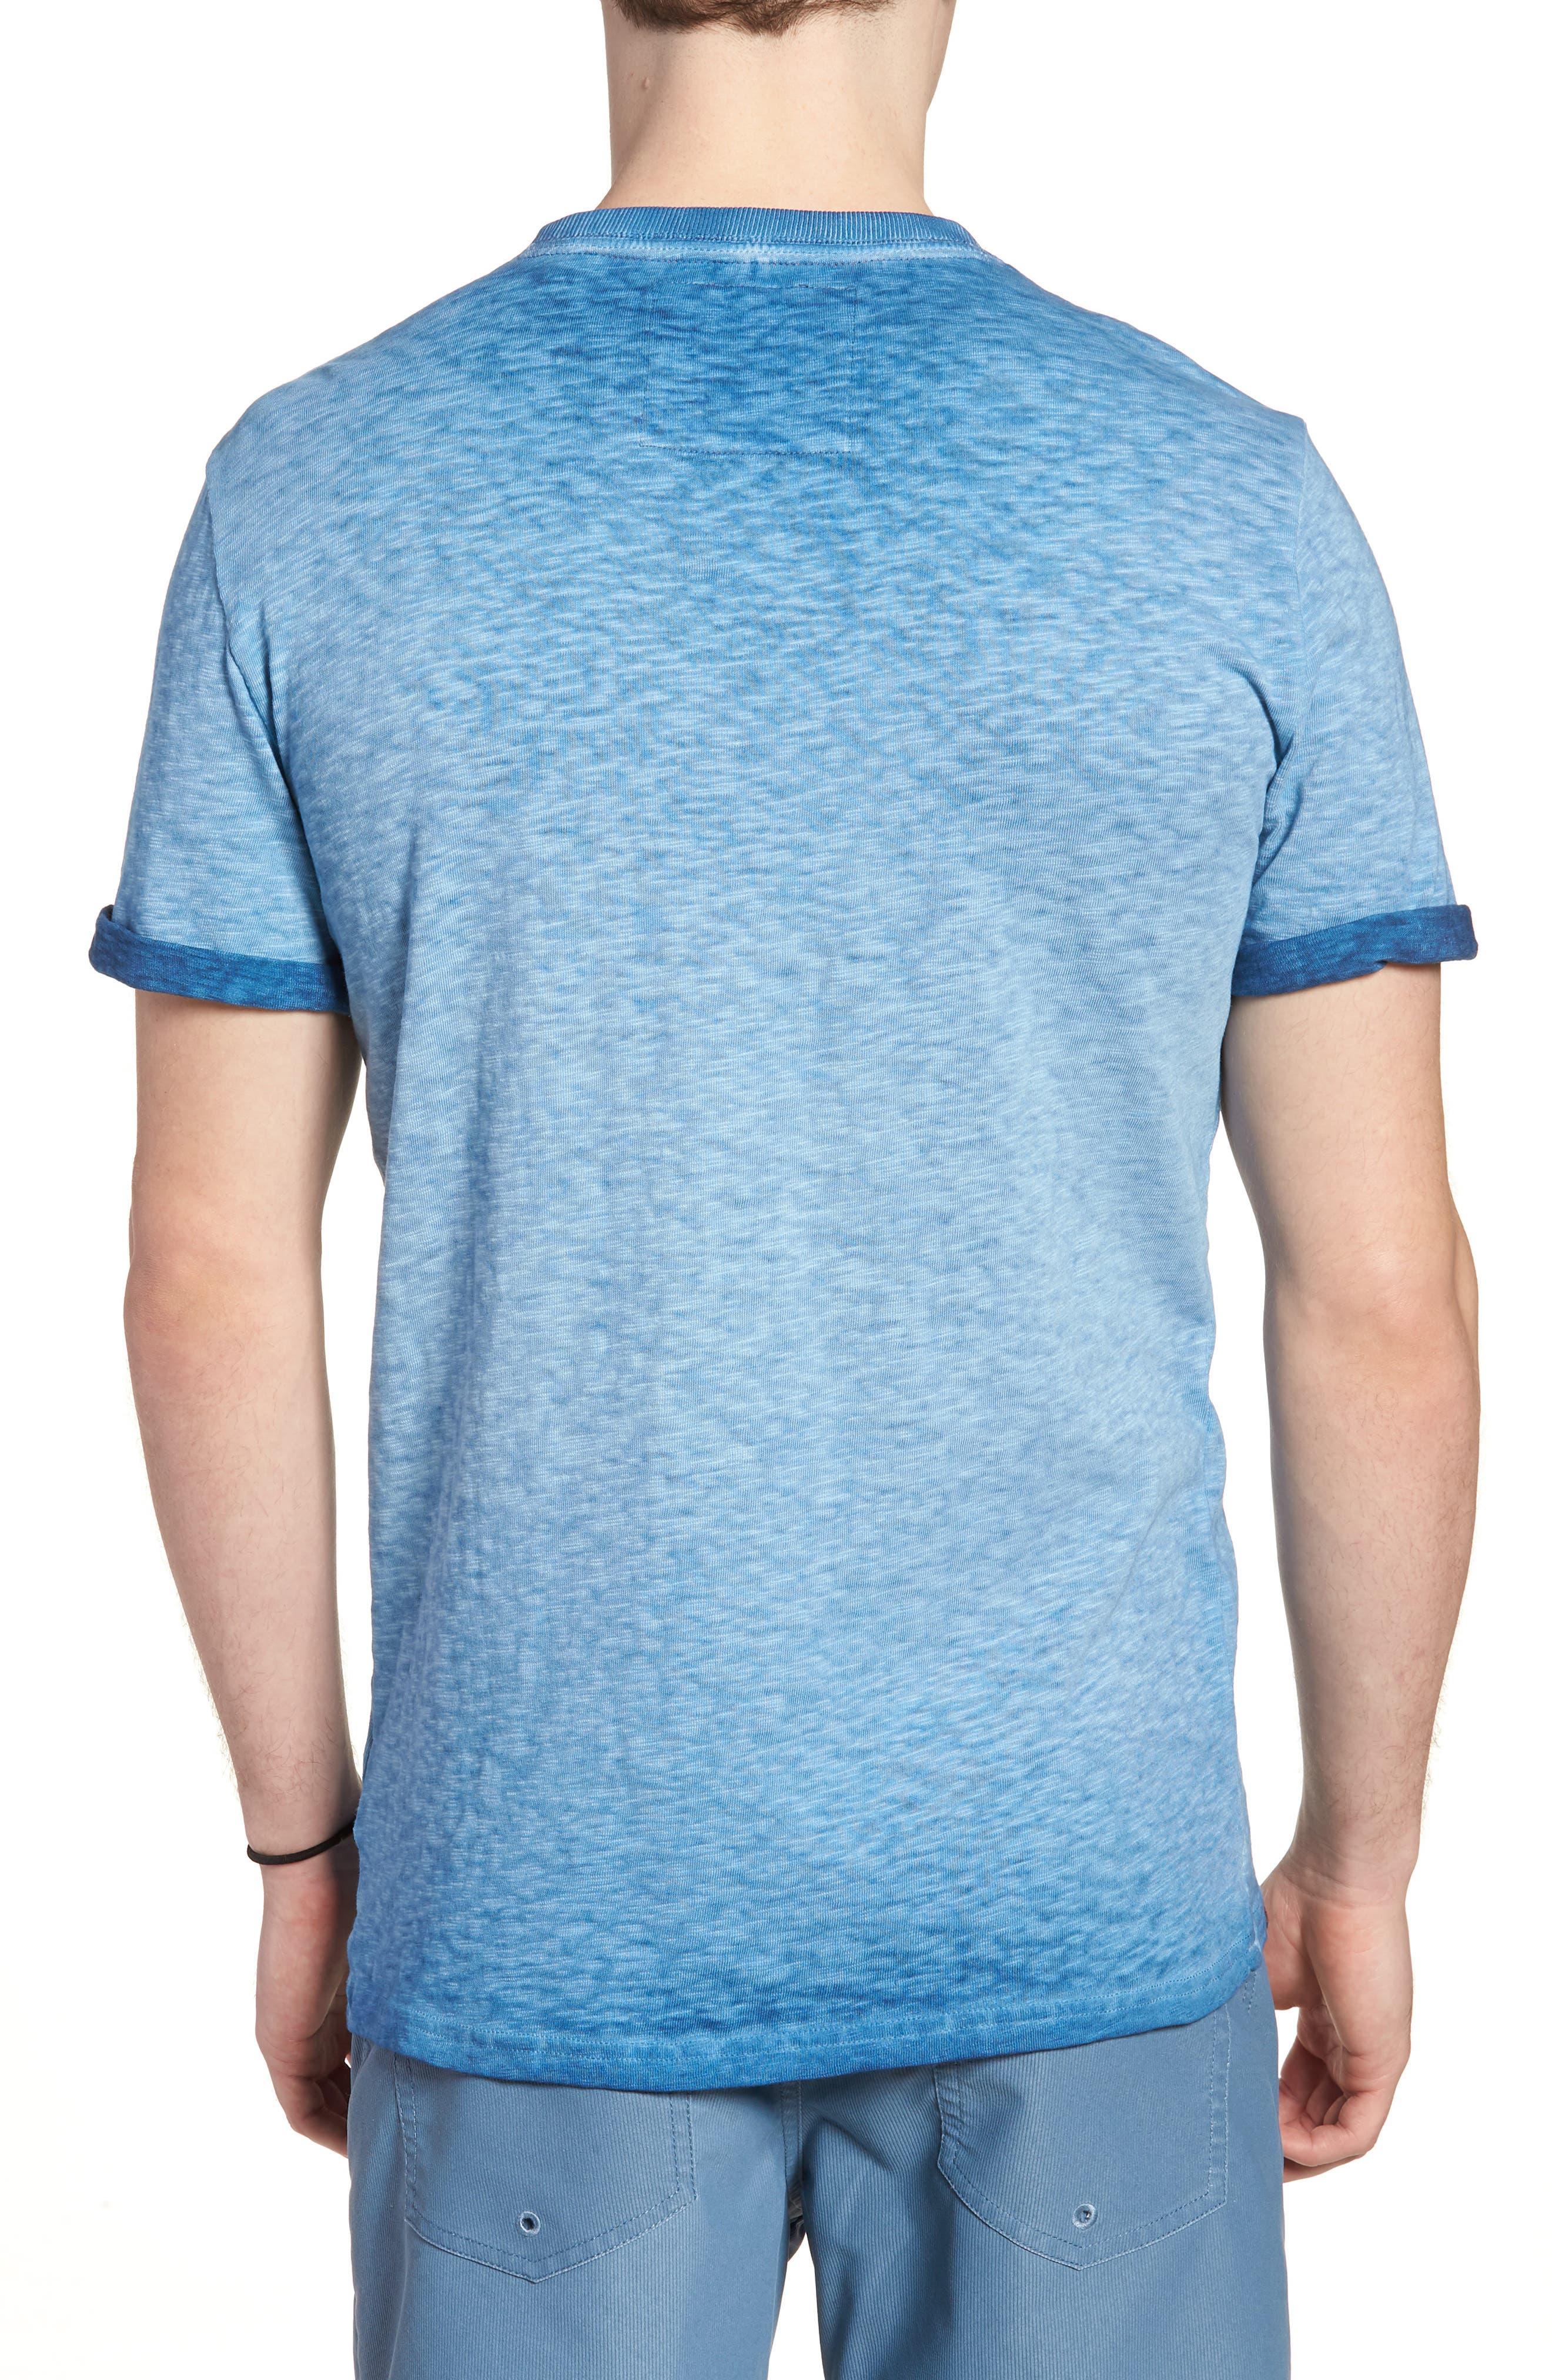 Orange Label Low Roller T-Shirt,                             Alternate thumbnail 6, color,